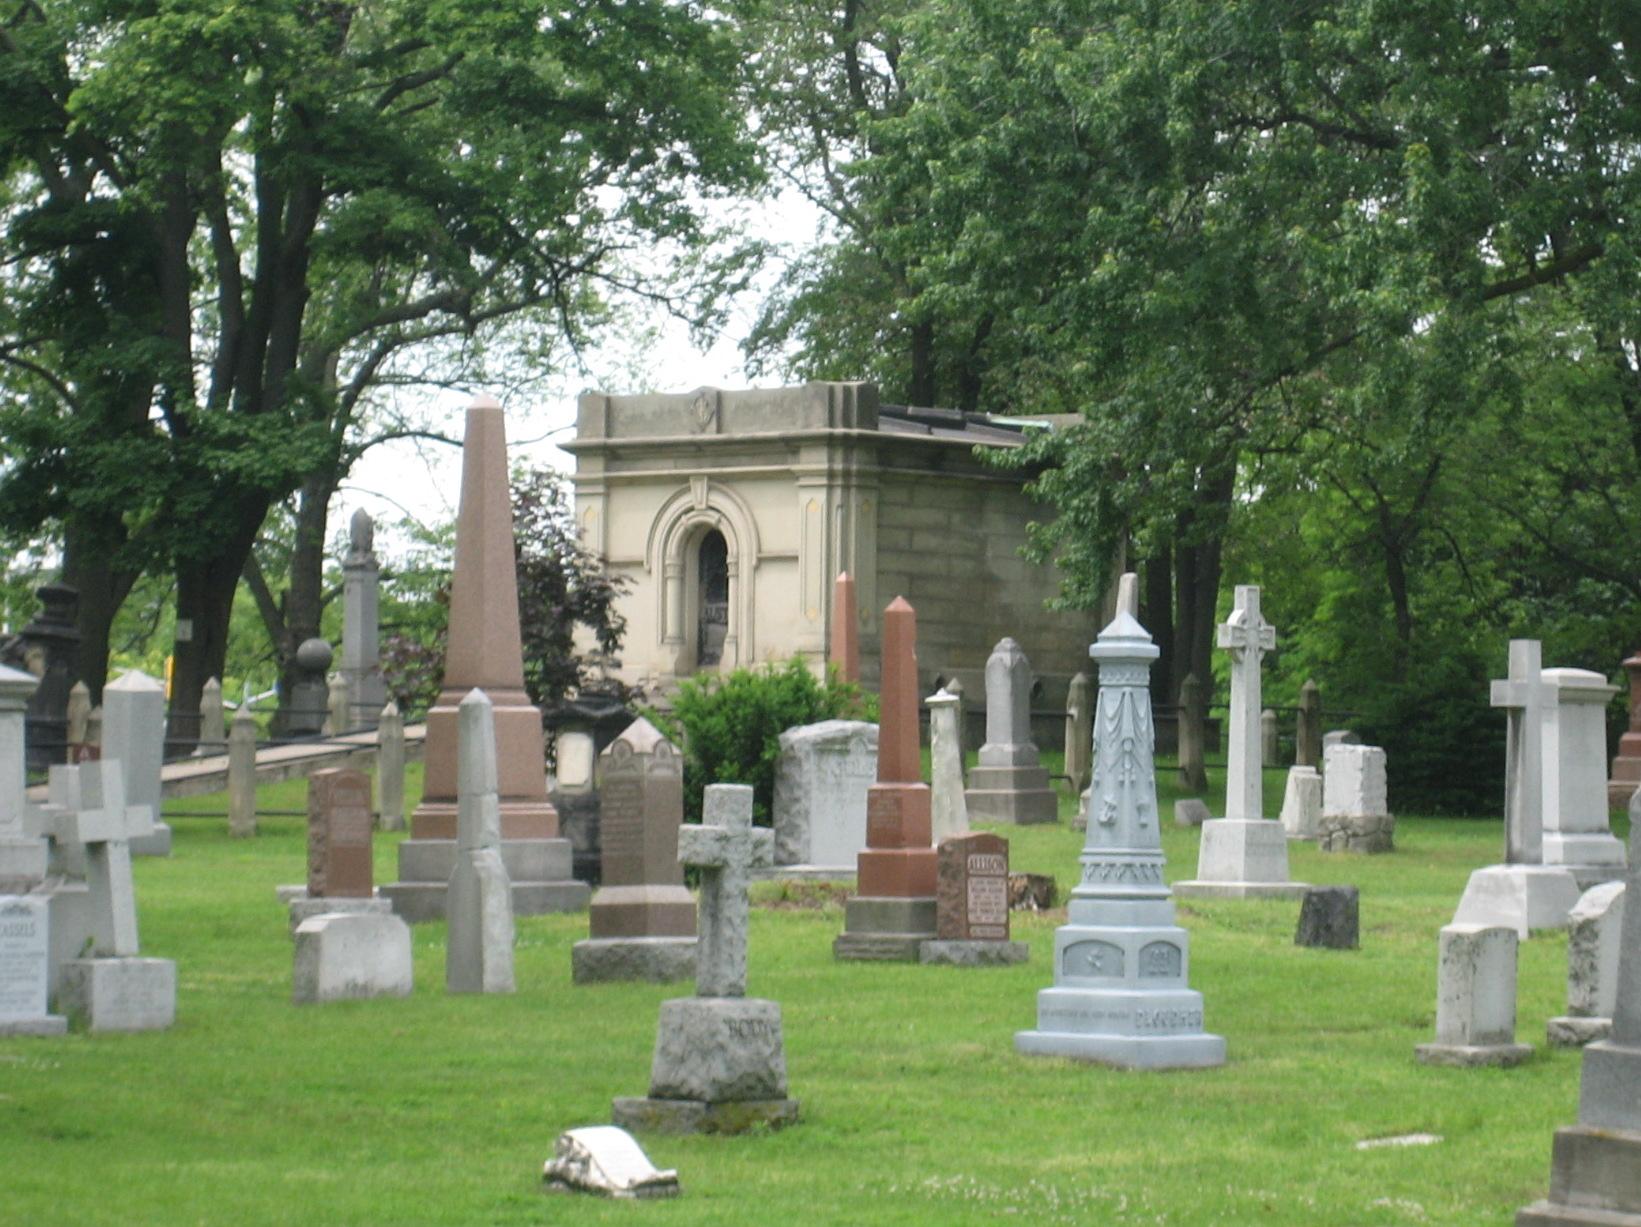 pics photos cemetery - photo #3